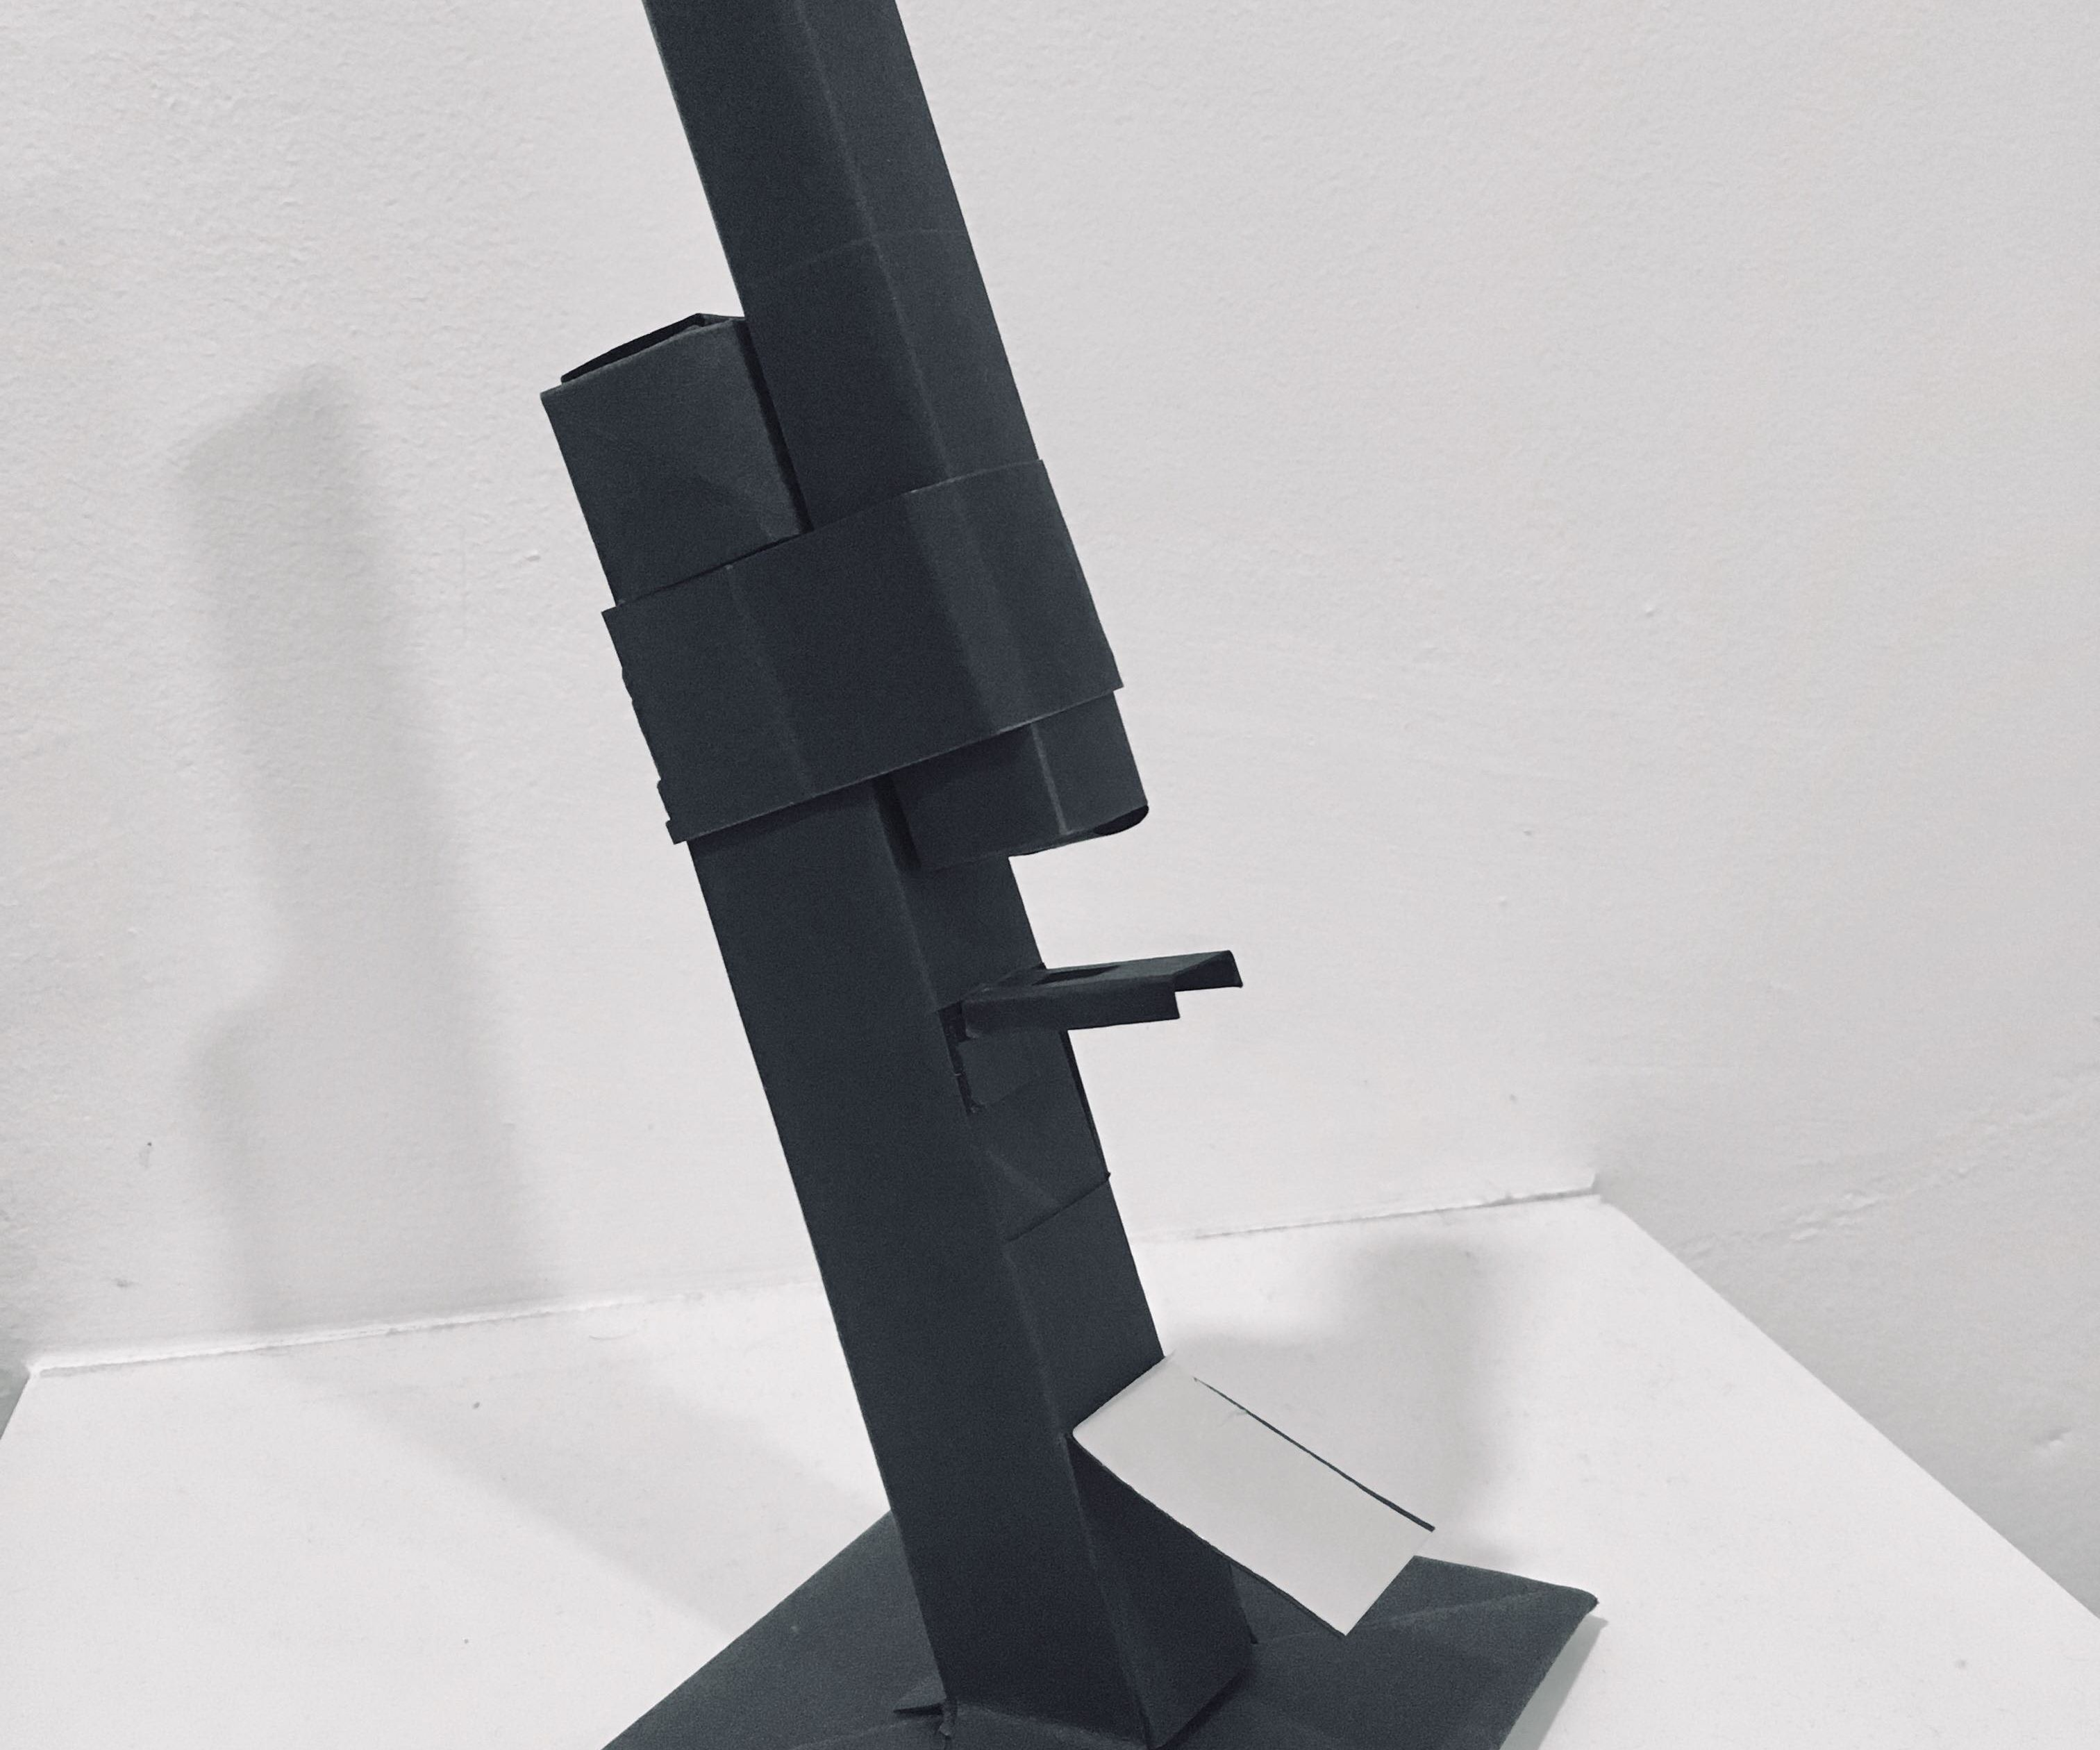 DIY Origami Microscope